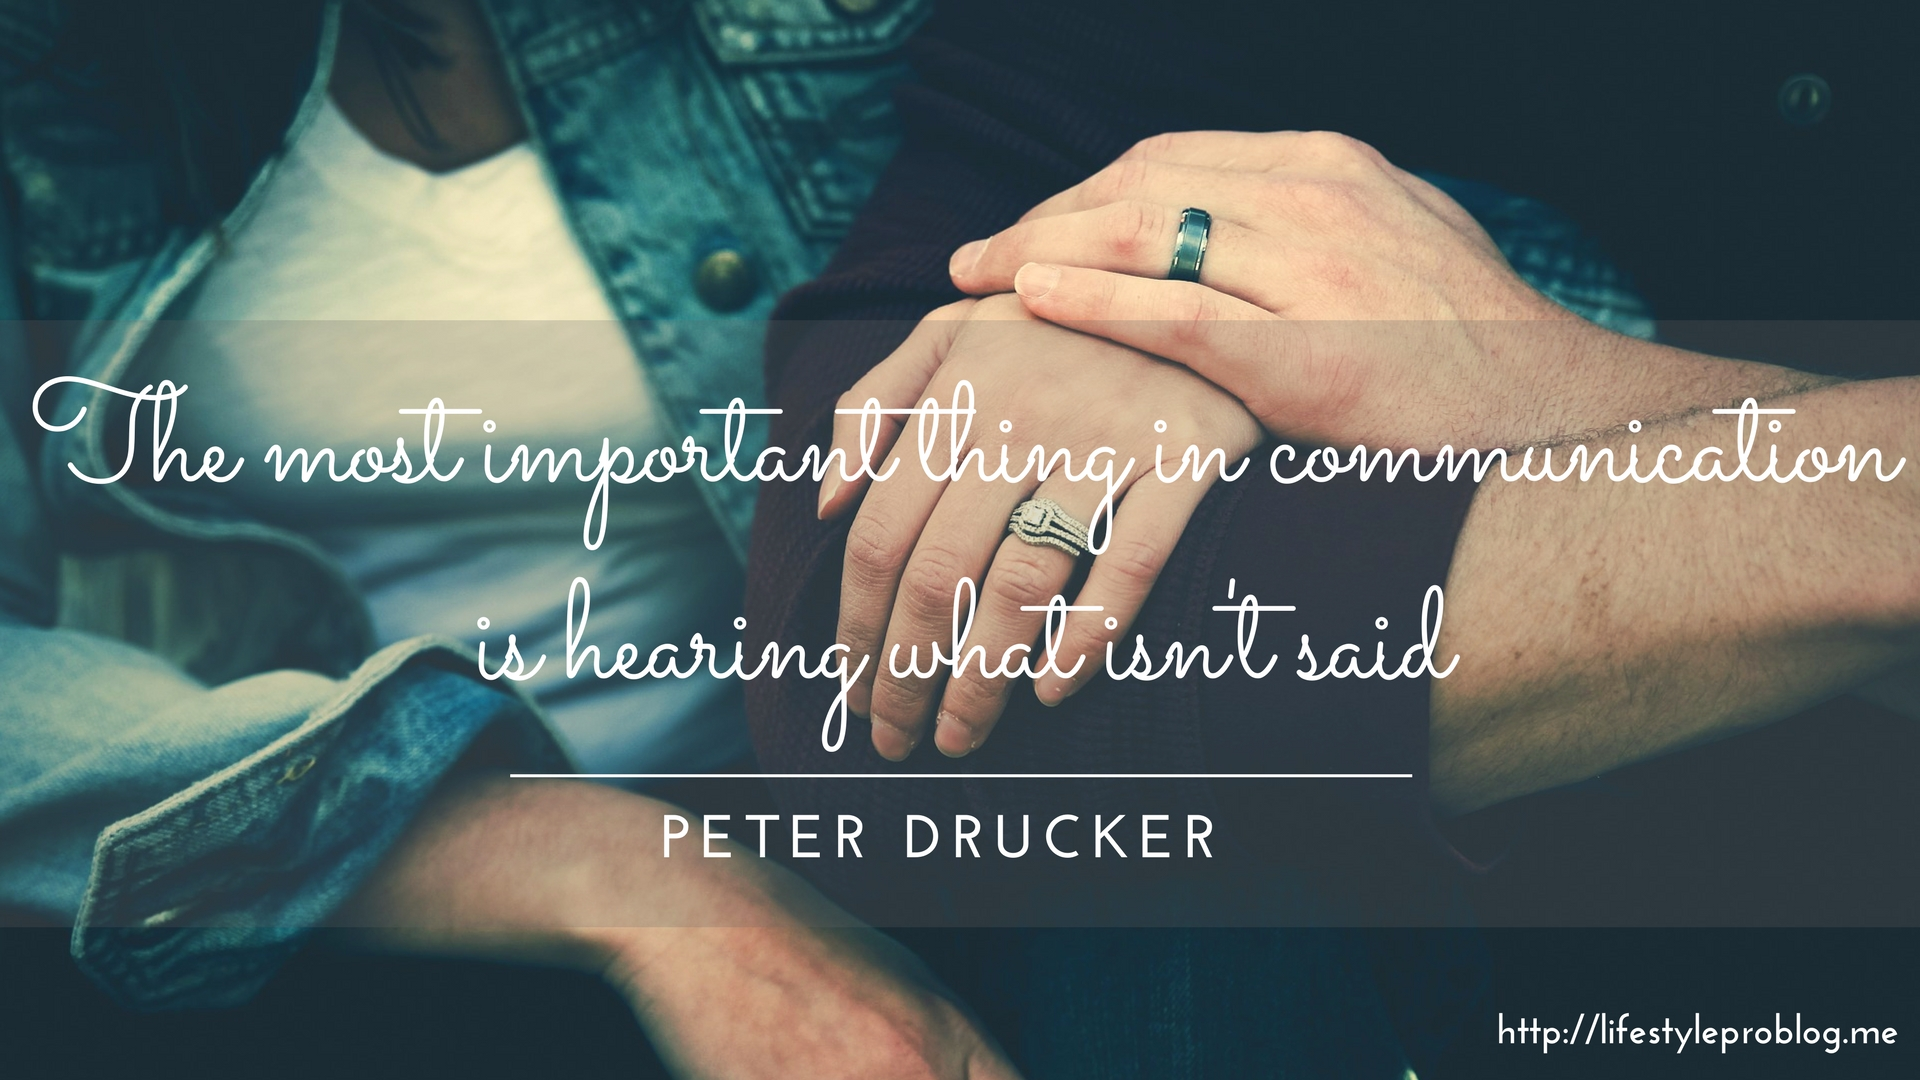 #AtoZChallenge : Peter Drucker Quote